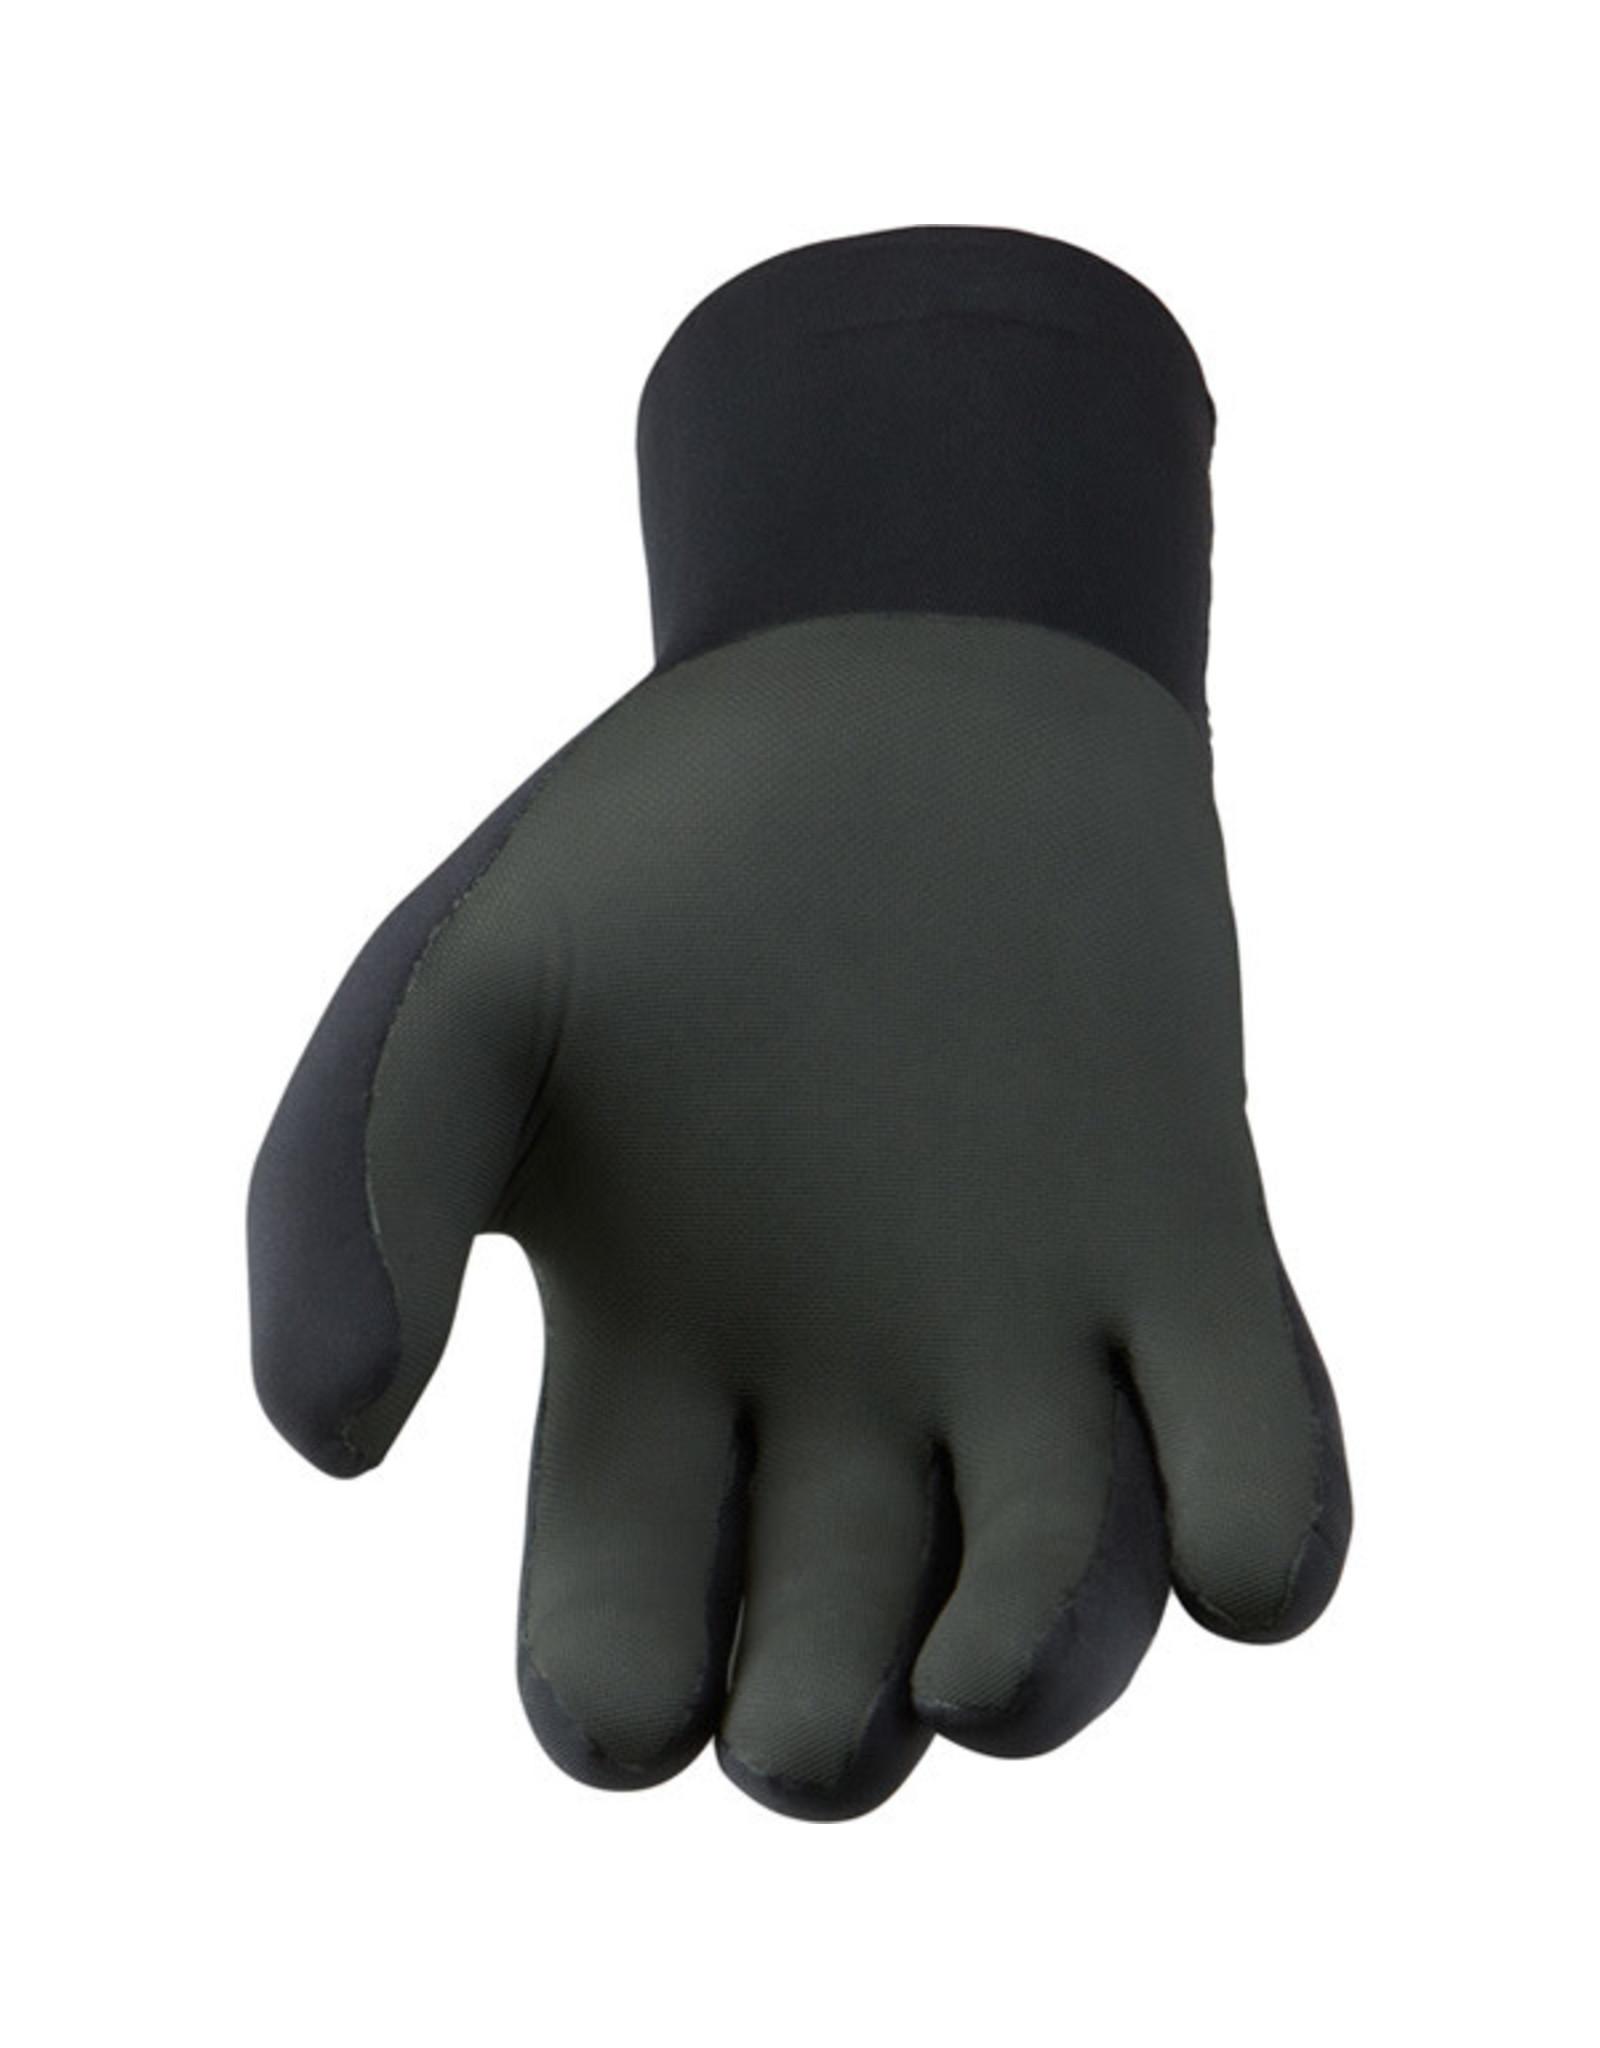 Madison Shield Neoprene Glove